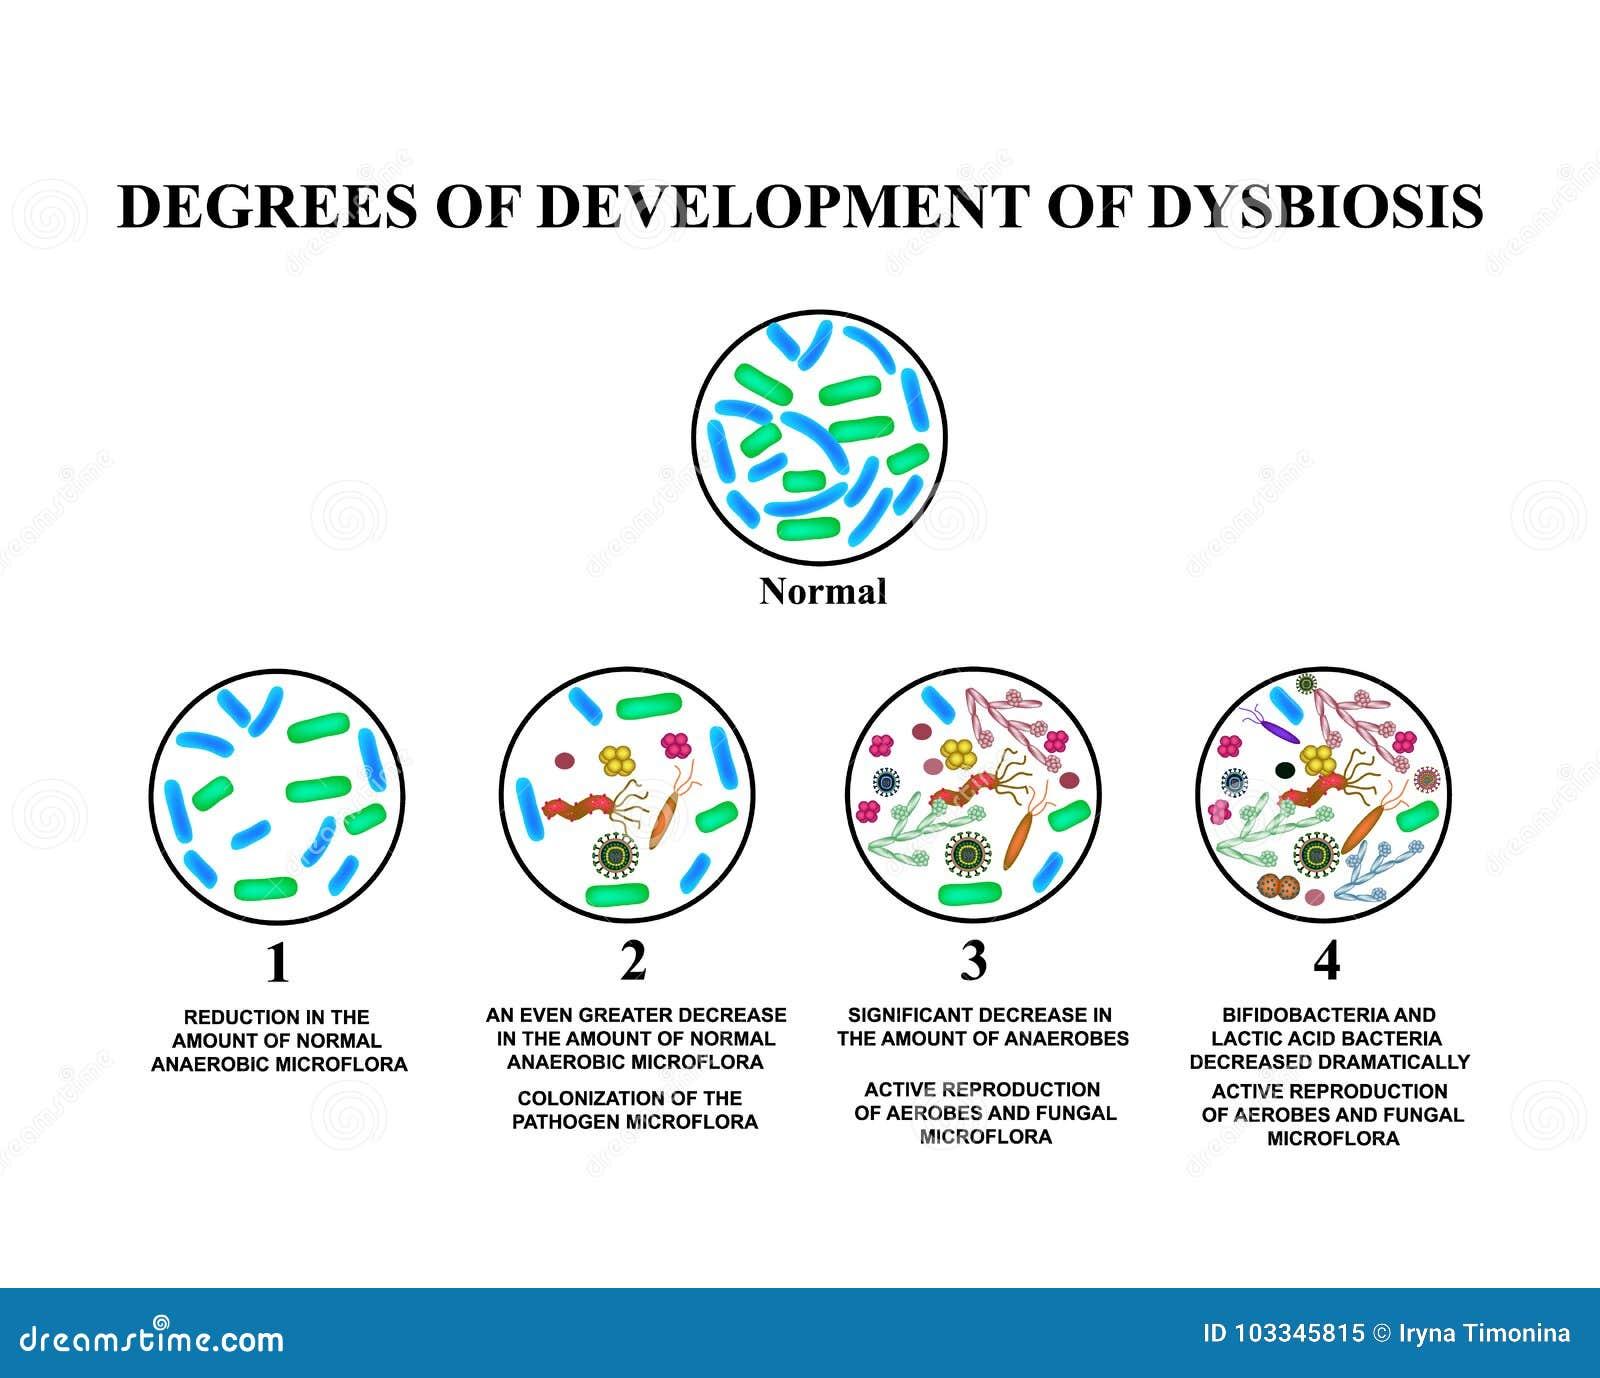 4 degrees of development of dysbiosis dysbacteriosis of the 4 degrees of development of dysbiosis dysbacteriosis of the intestine large intestine dysbiosis colon bacteria fungi viruses ccuart Choice Image